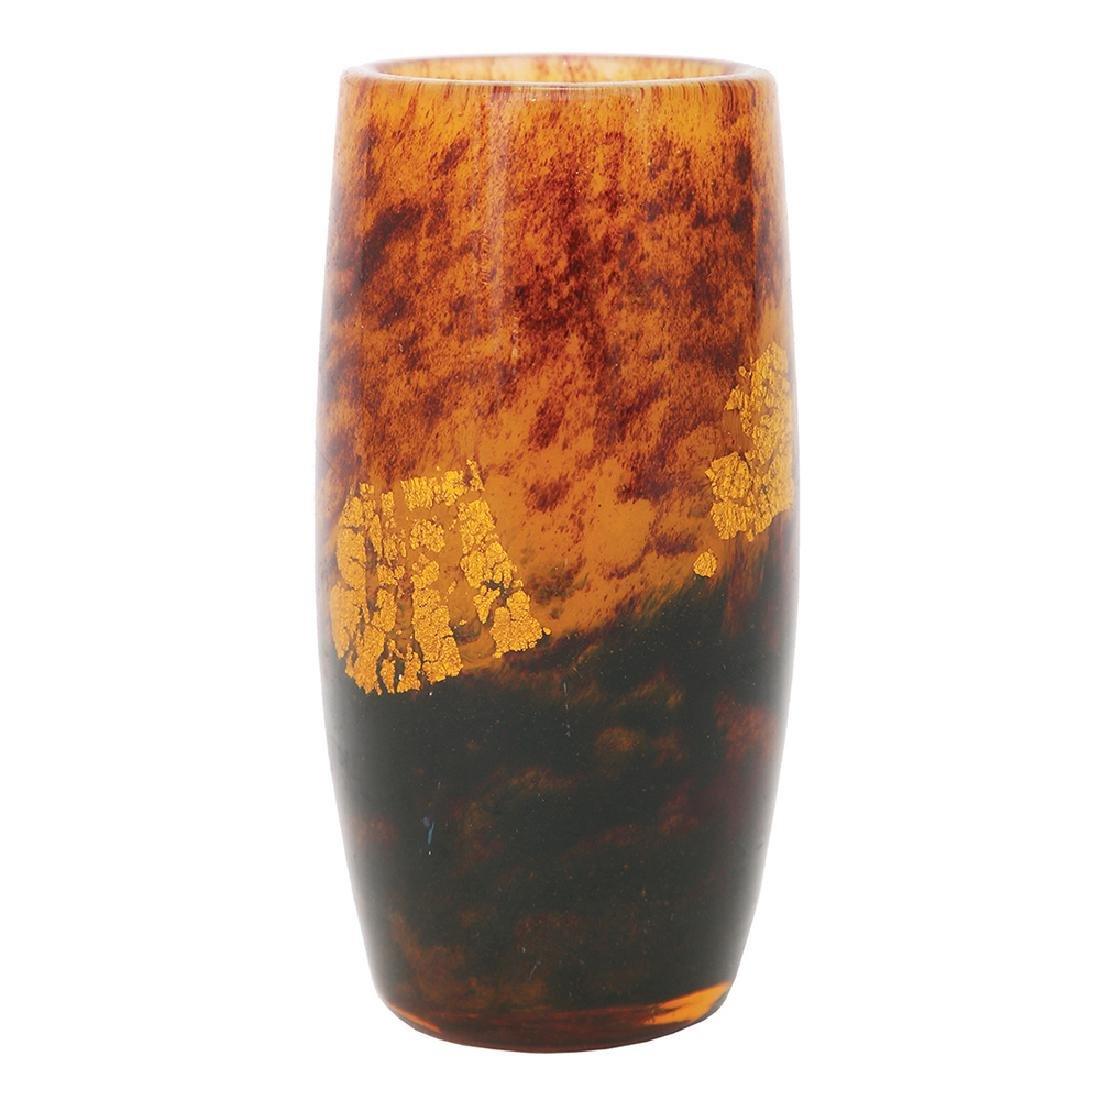 A DAUM NANCY MOTTLED GLASS VASE